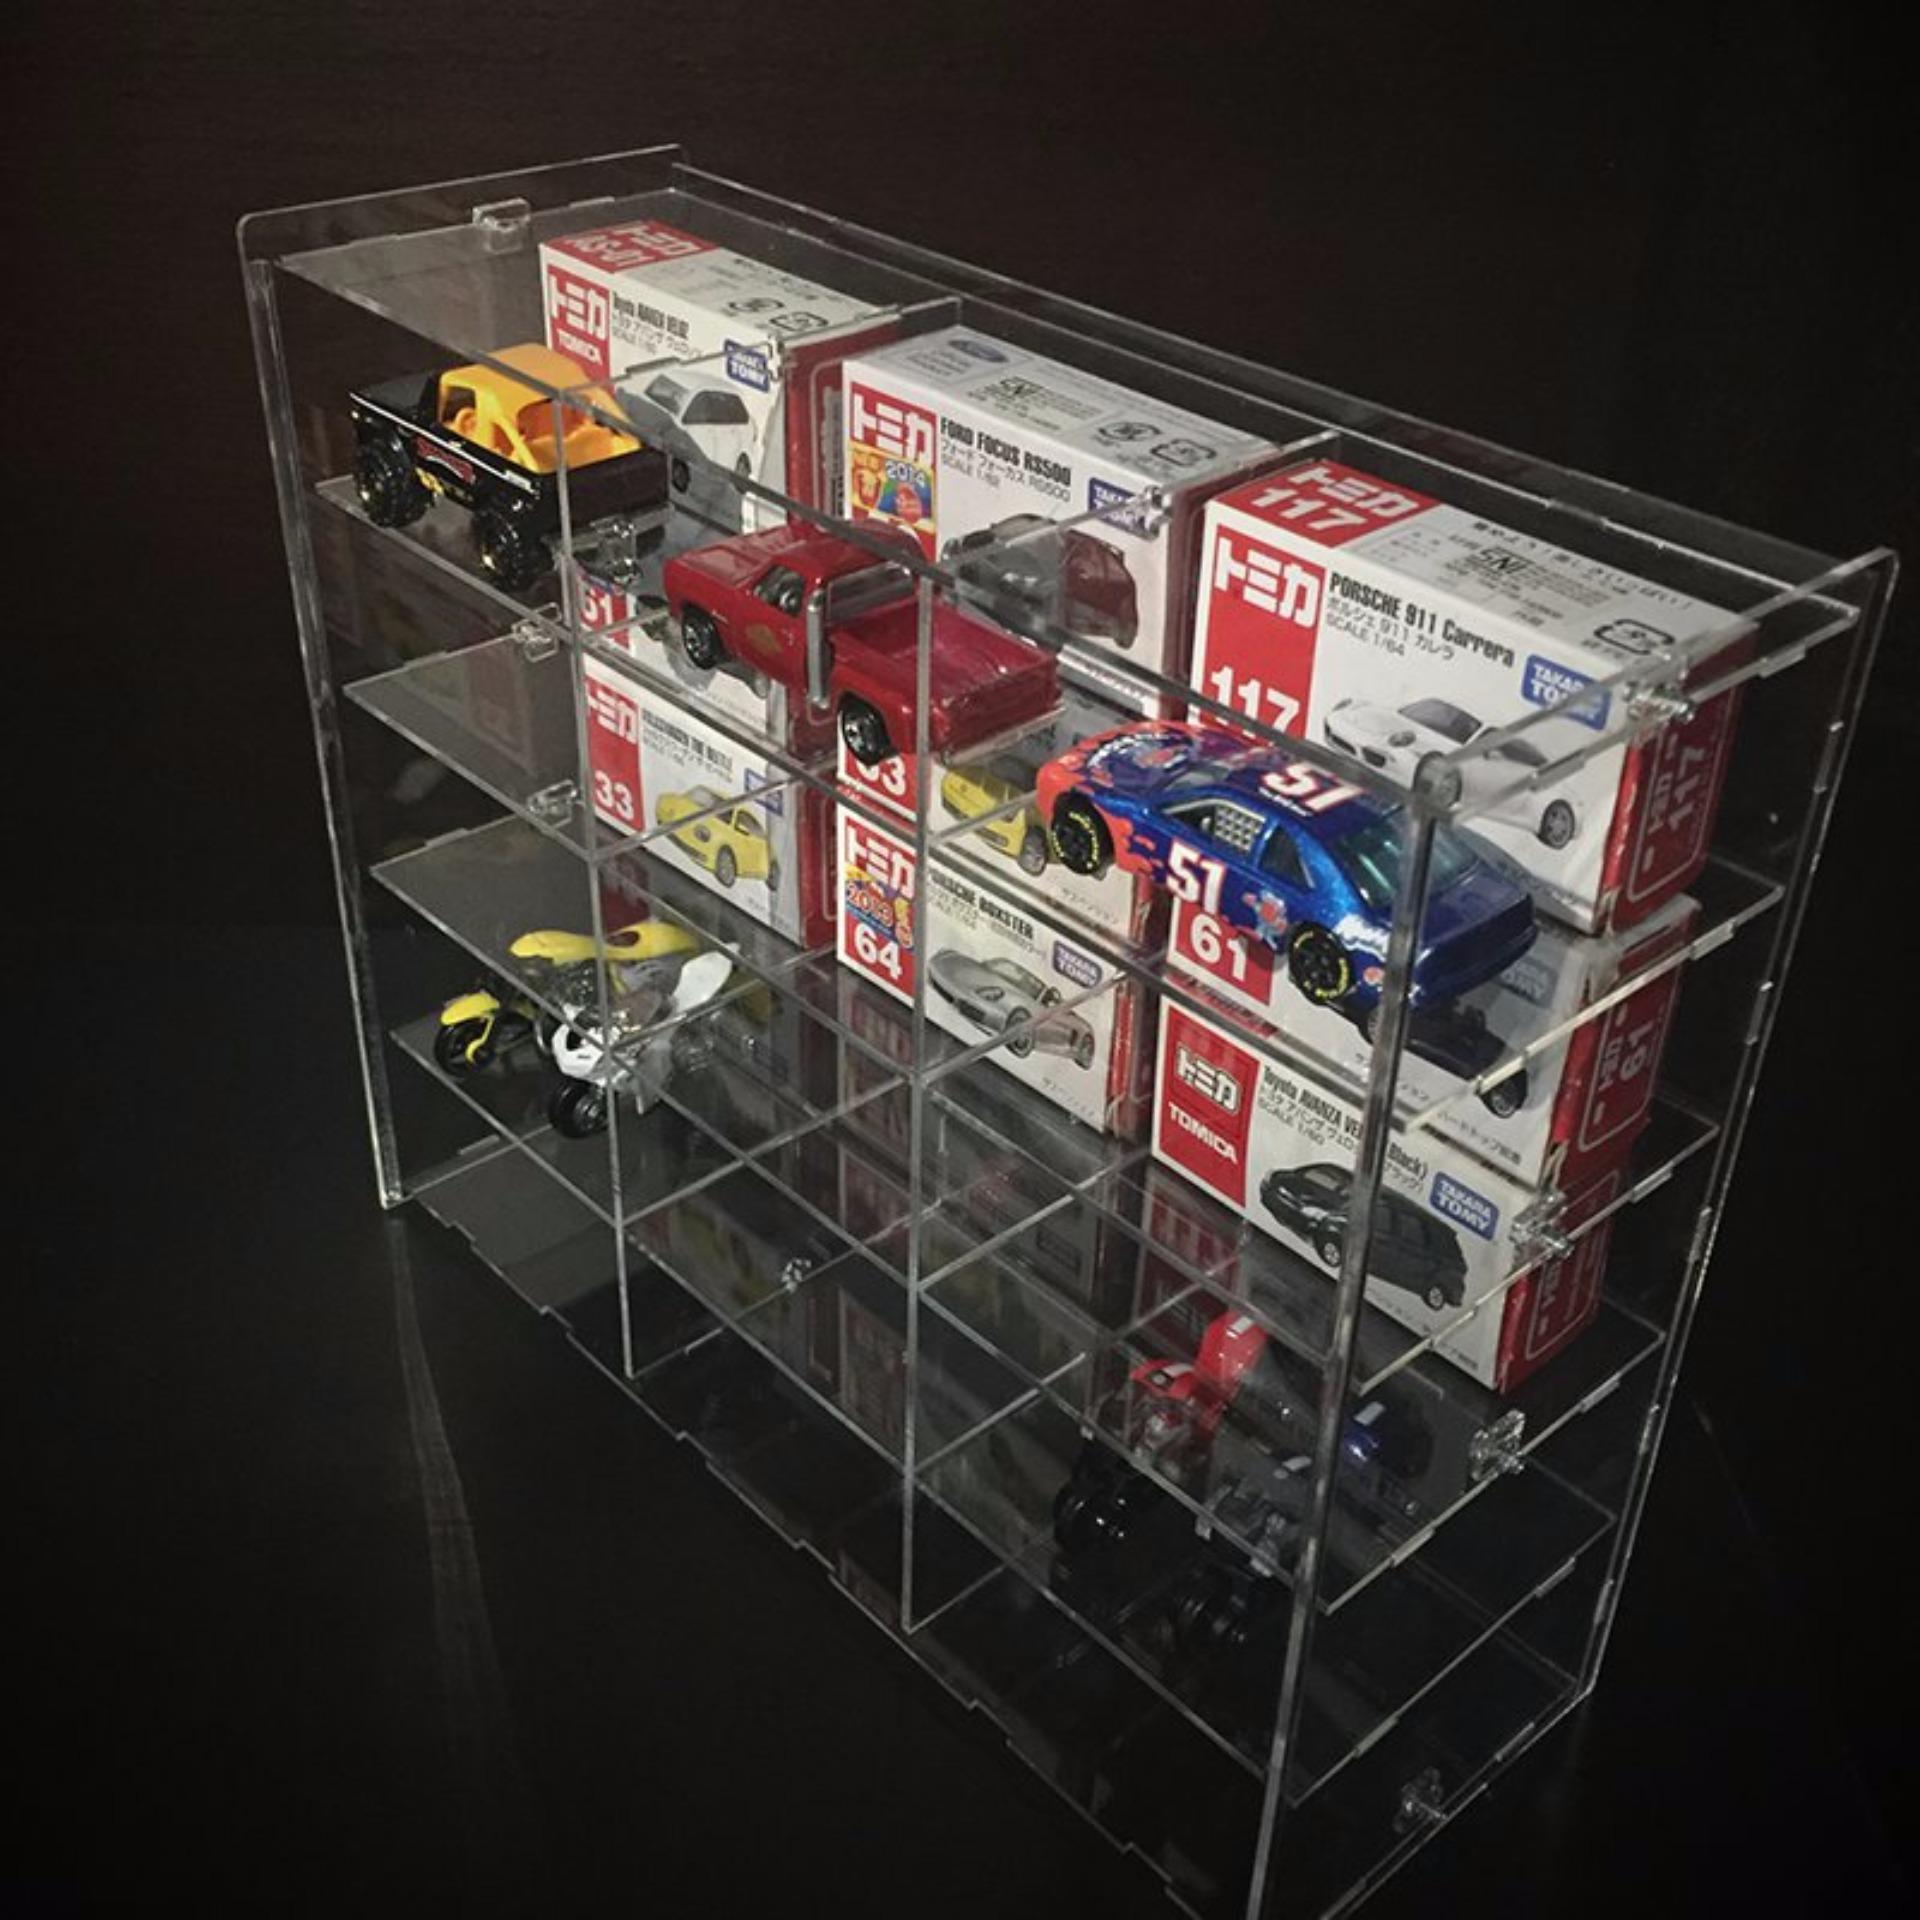 Harga Penawaran Rak Tomica Double Isi 15 Bahan Akrilik 2mm Flash Sale Diecast Mainan Hotwheels